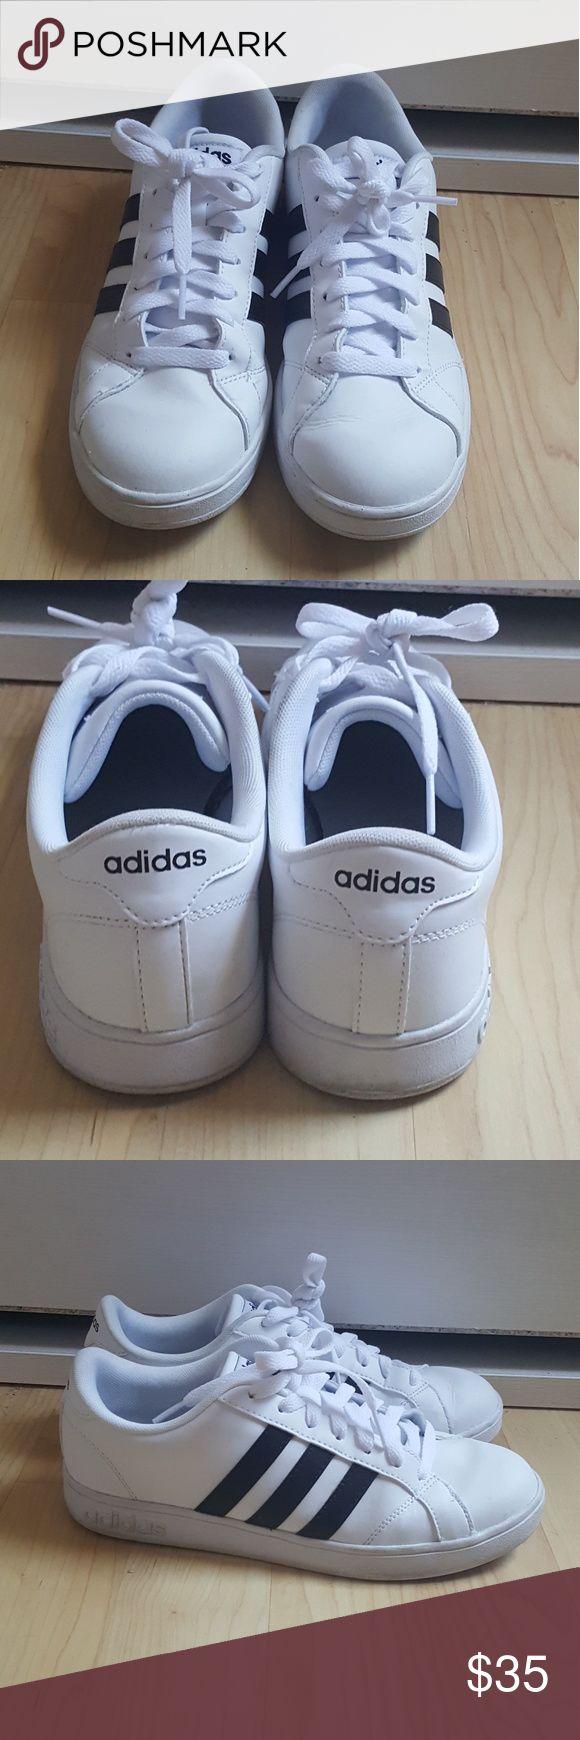 donna neo basale scarpe adidas